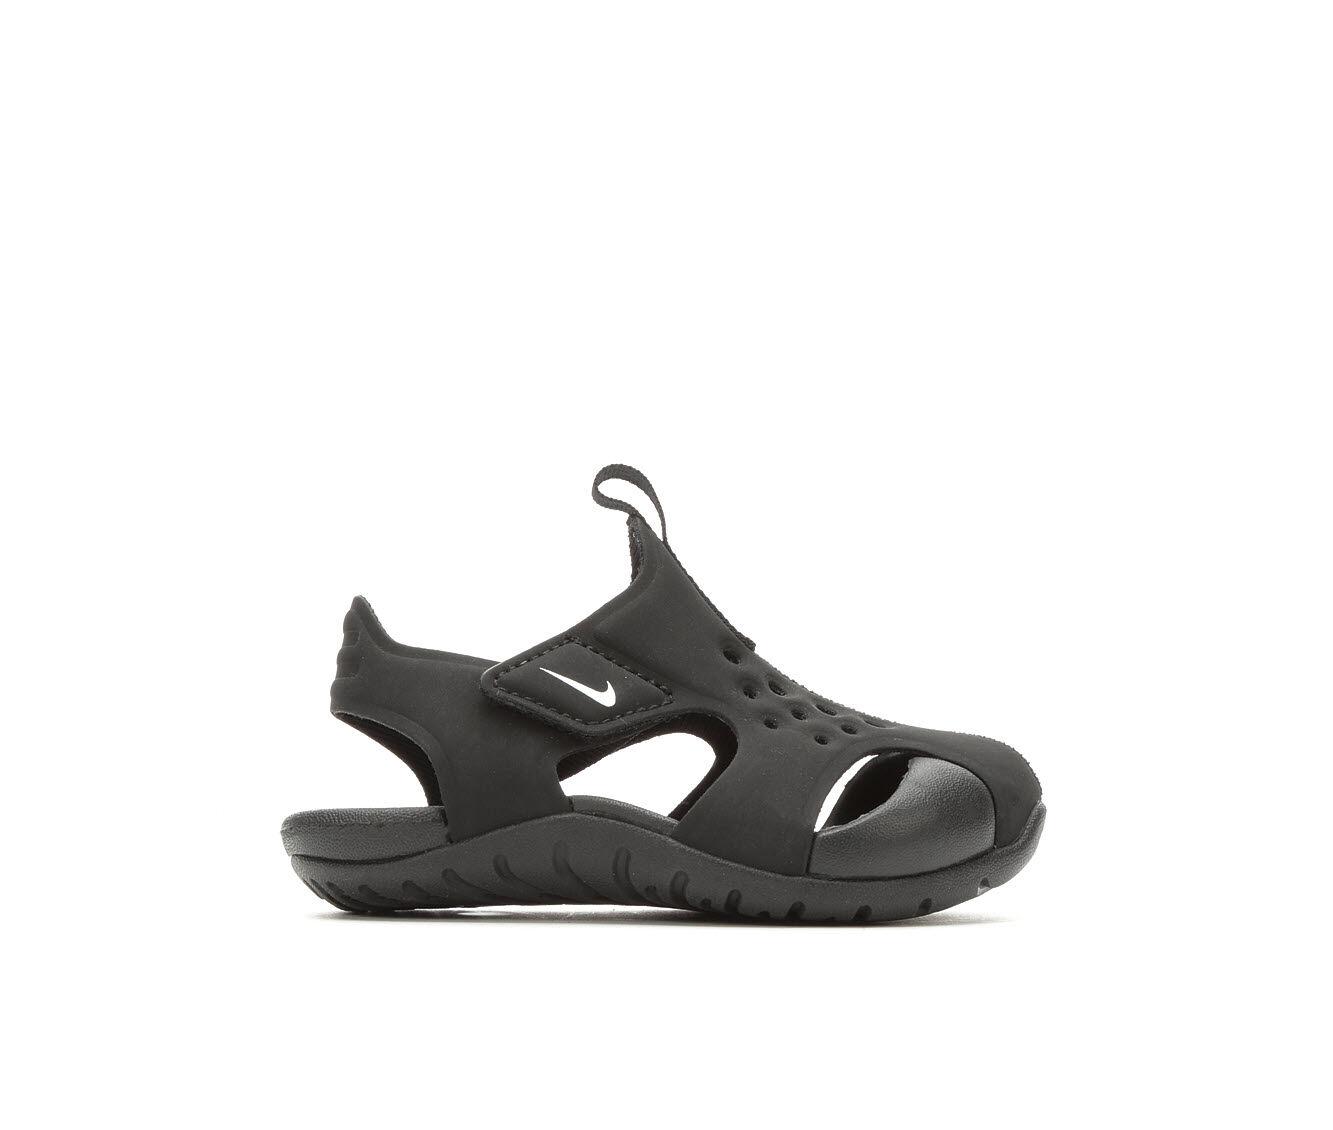 Kids' Nike Infant \u0026 Toddler Sunray